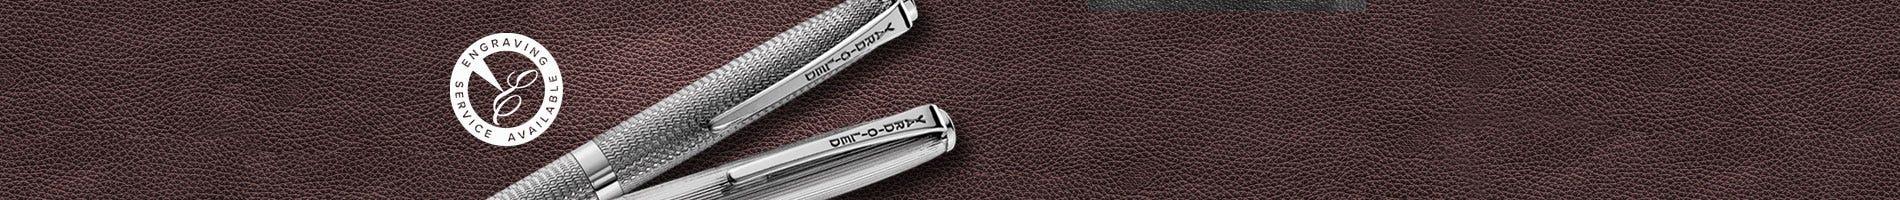 yard o led perfecta victorian pen